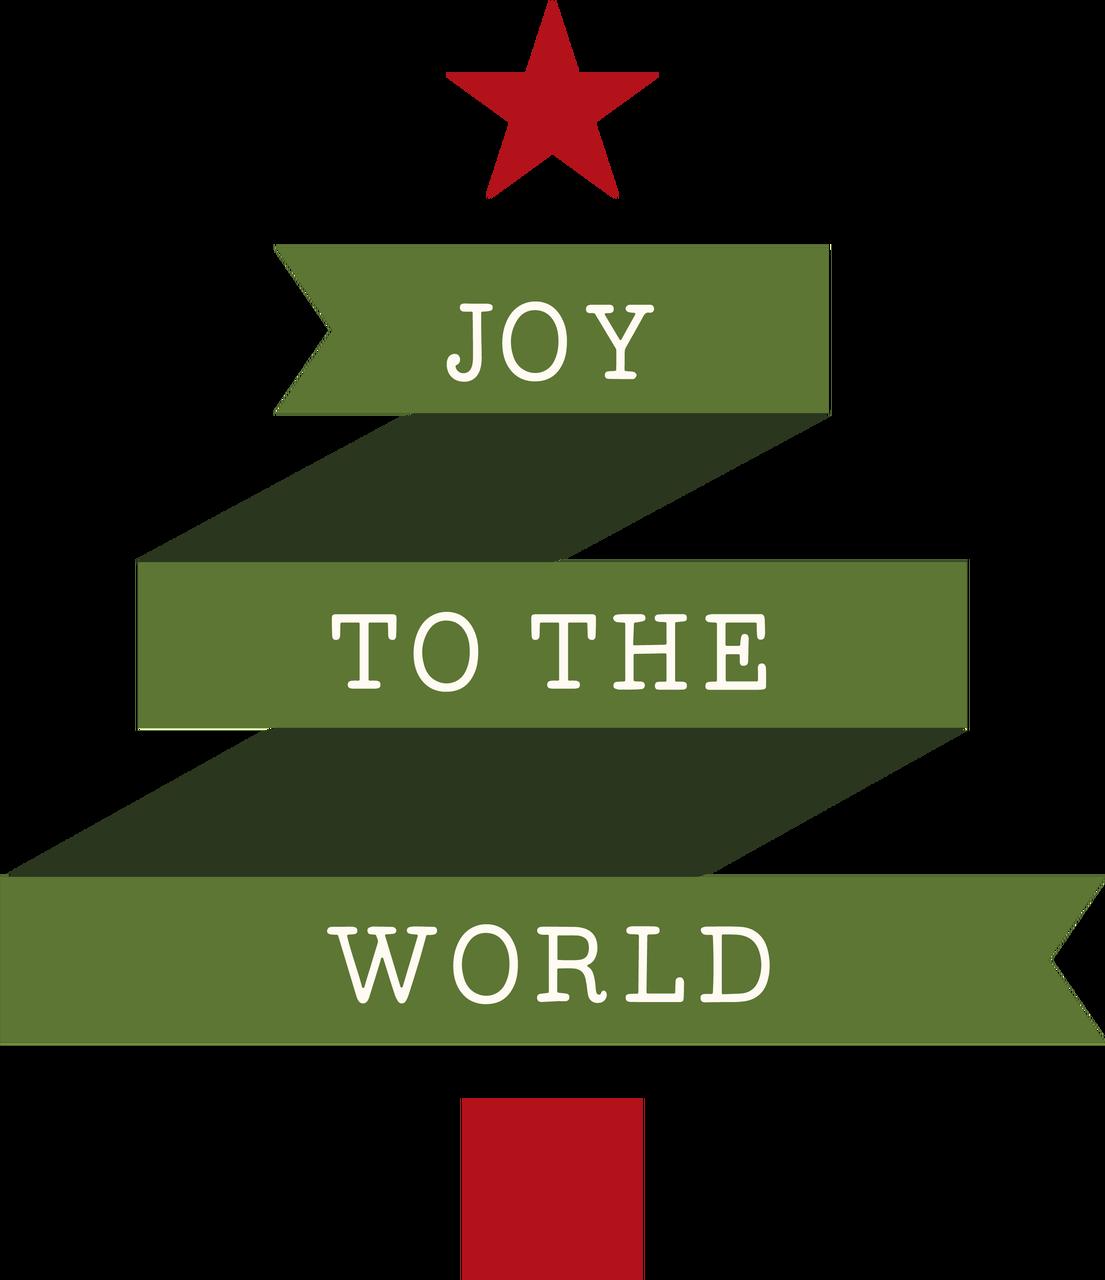 Joy To The World SVG Cut File